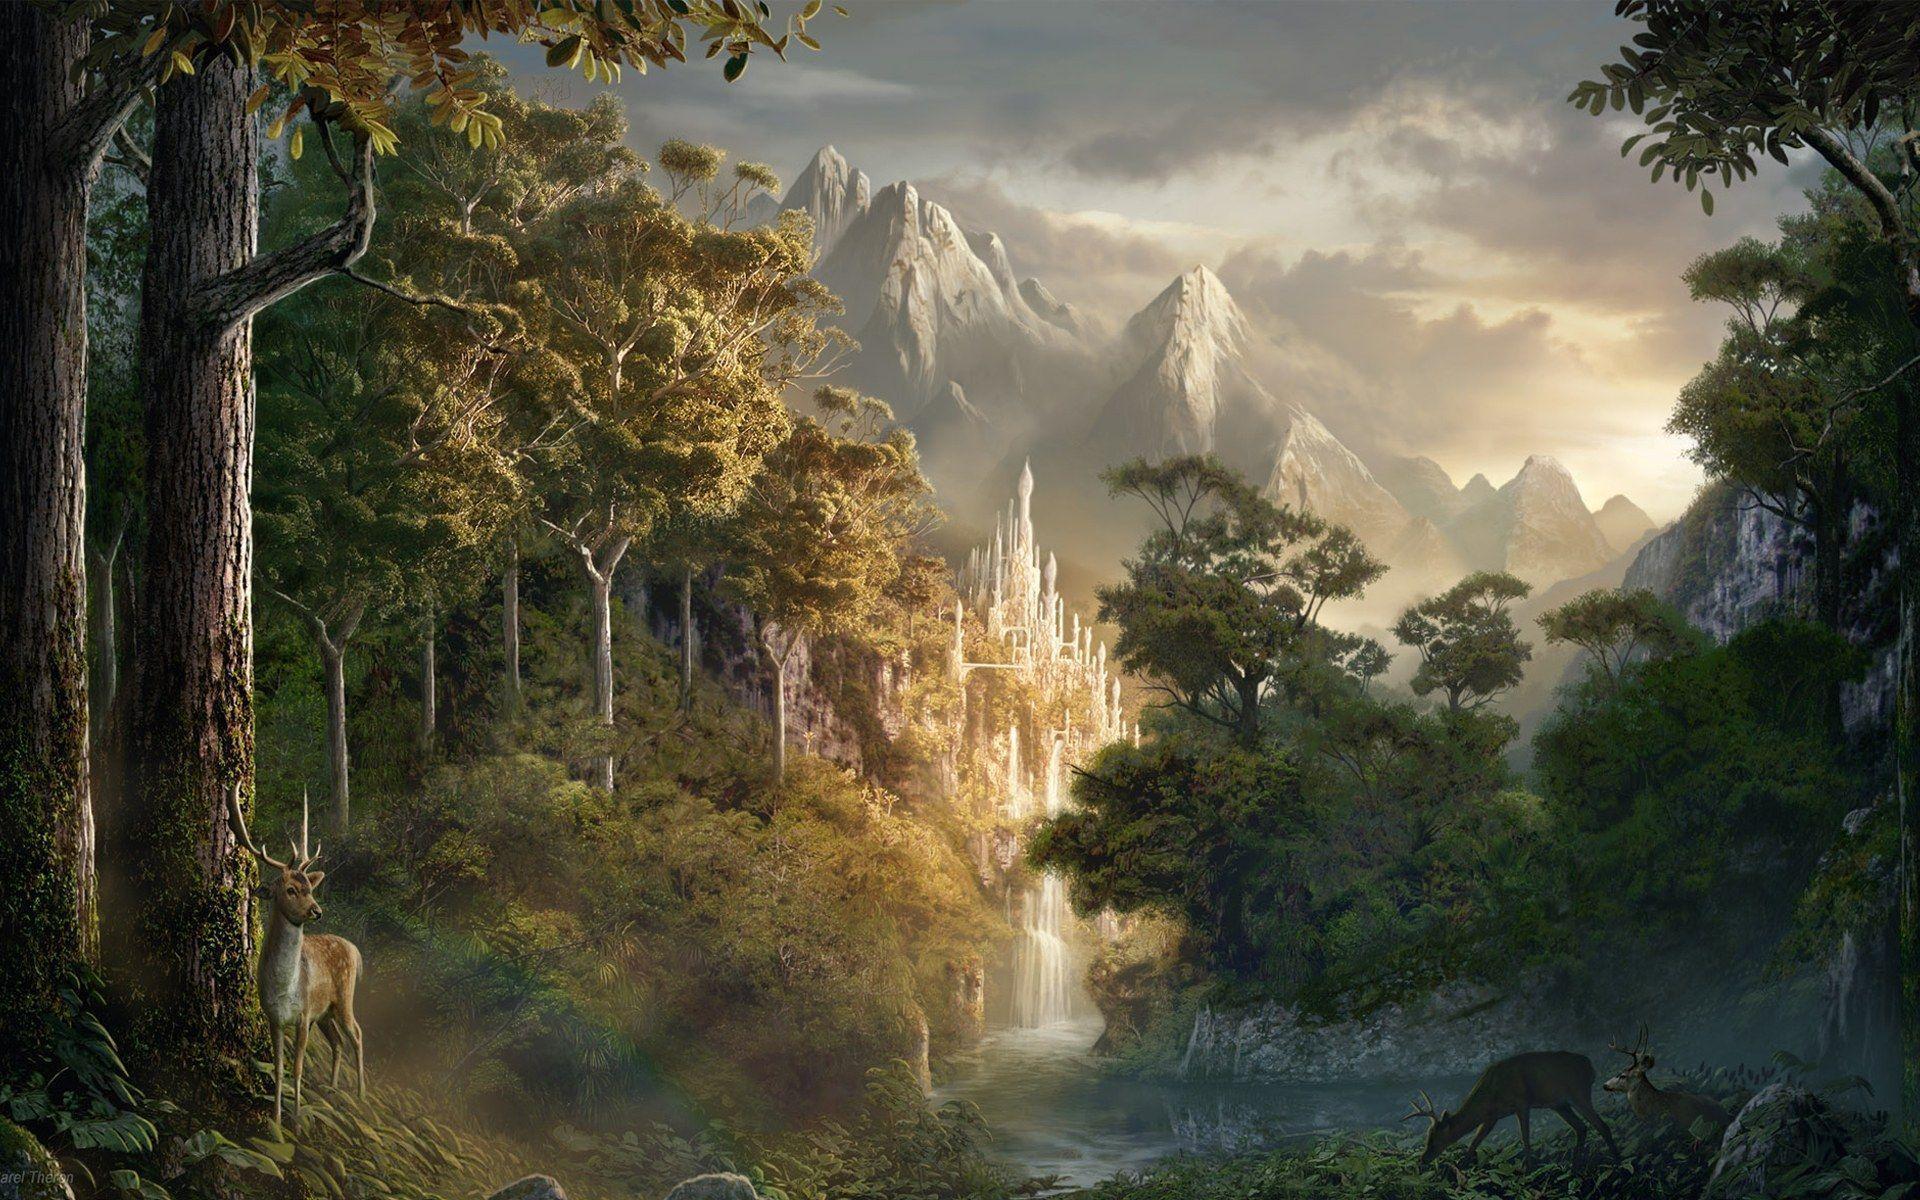 Fantasy Art Backgrounds - Wallpaper Cave